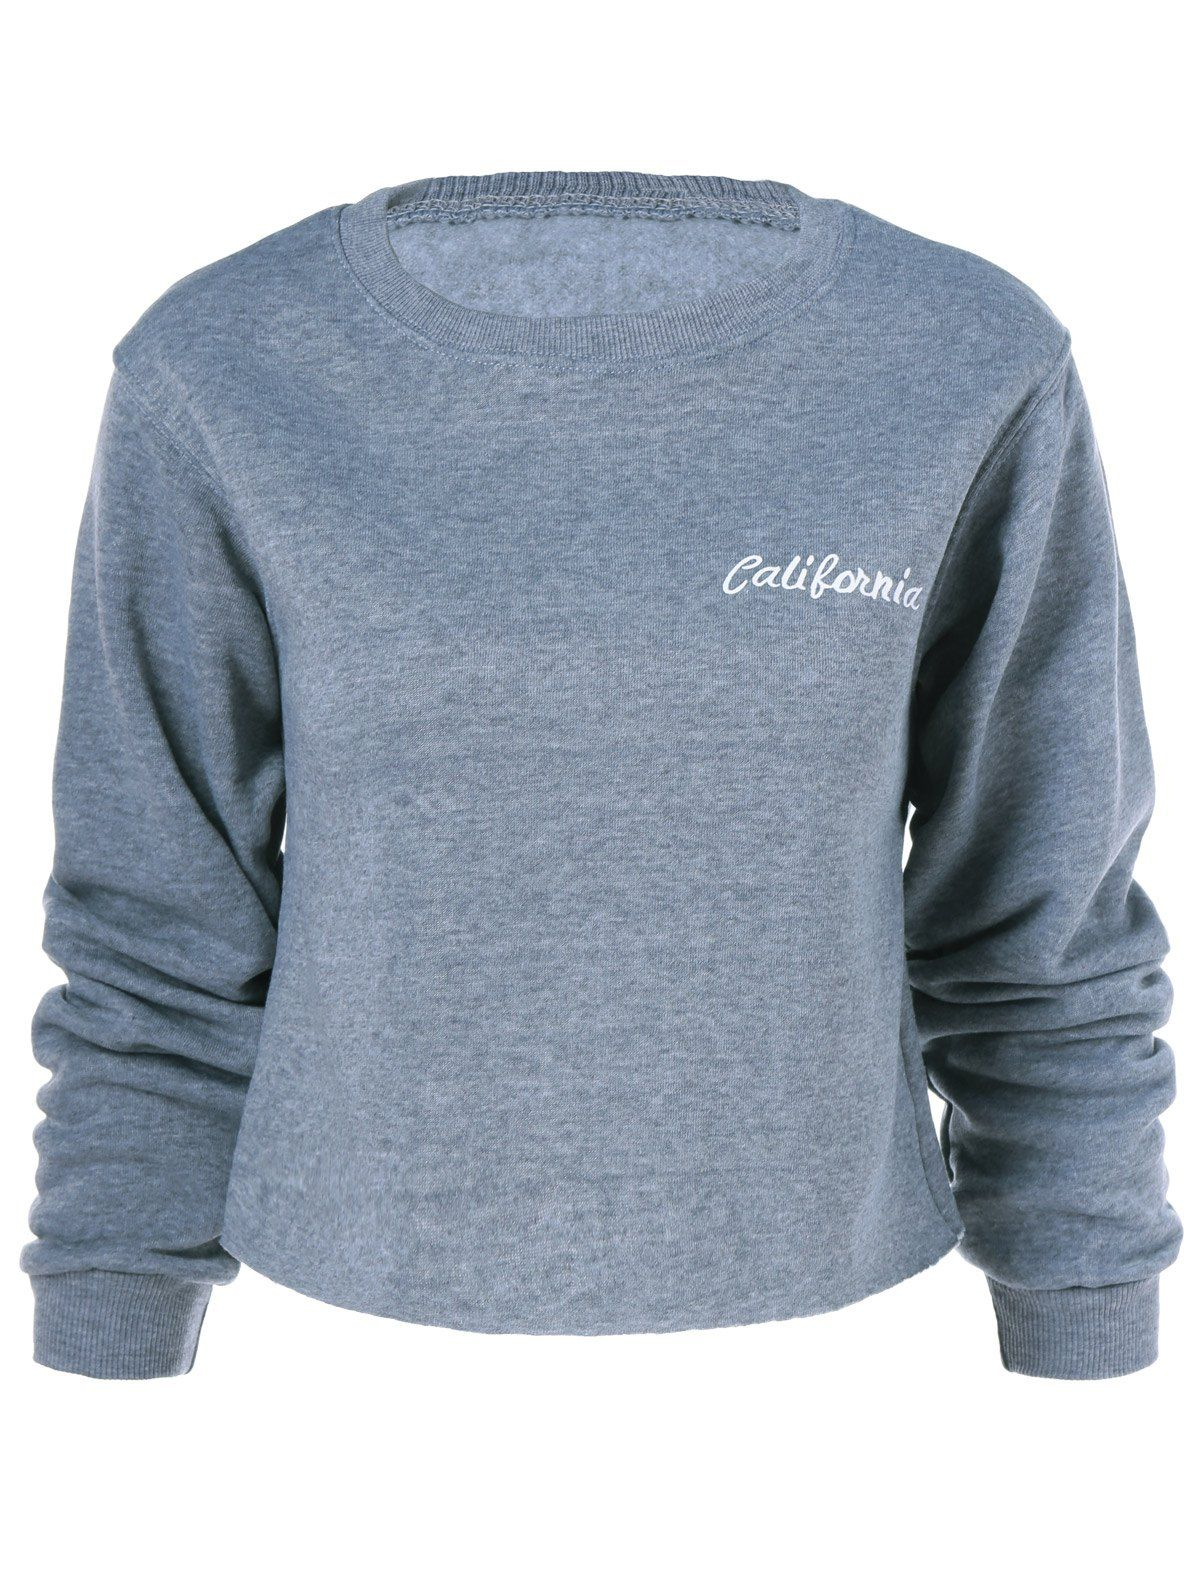 Long sleeve california sweatshirt women men hats watches